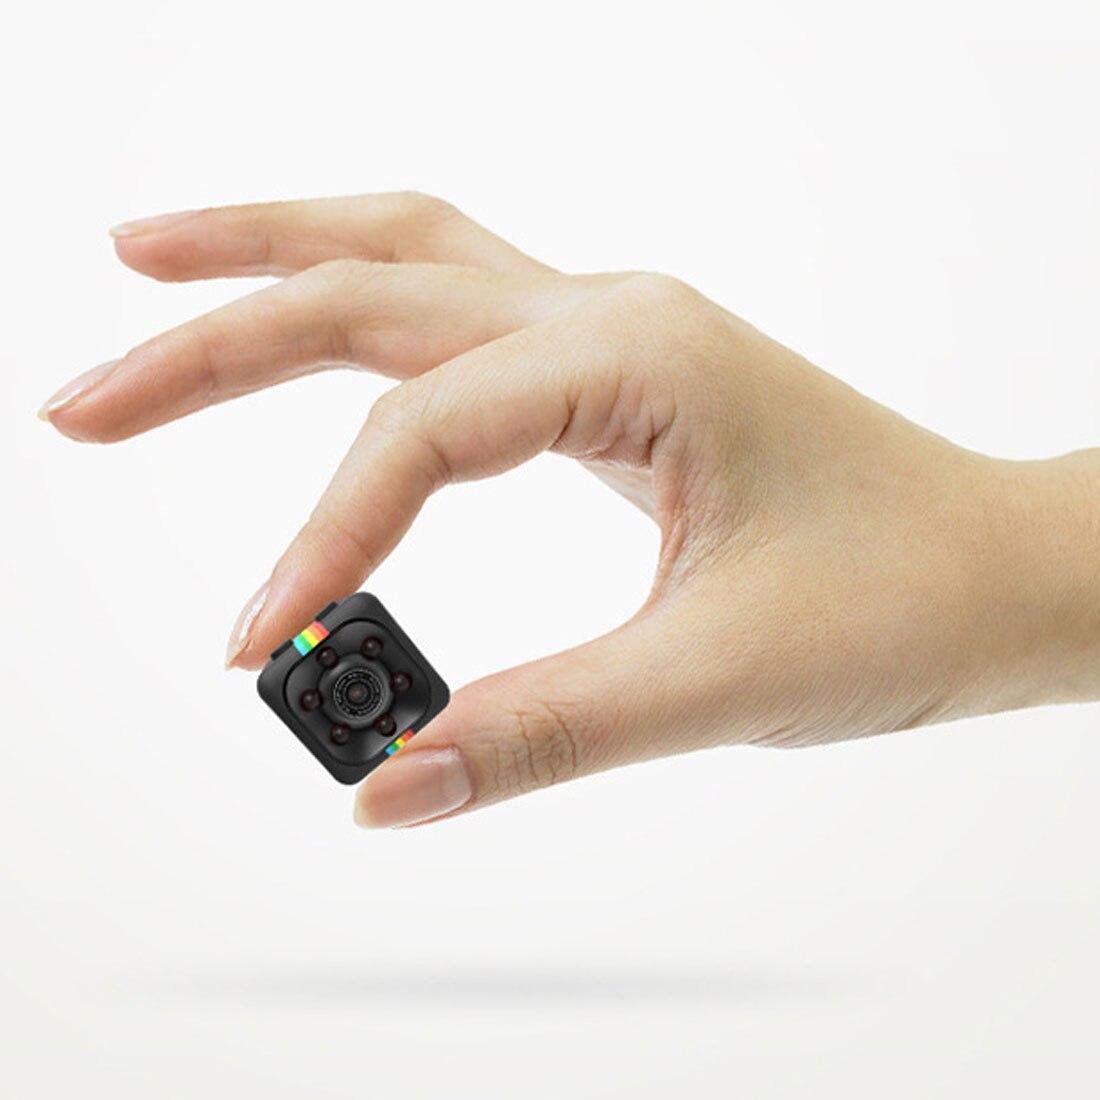 HONGDAK Hot Mini Camera Night Vision SQ11 Camcorder Sport Outdoor DV Voice Video Recorder Action Camera Support TF HD 1080P